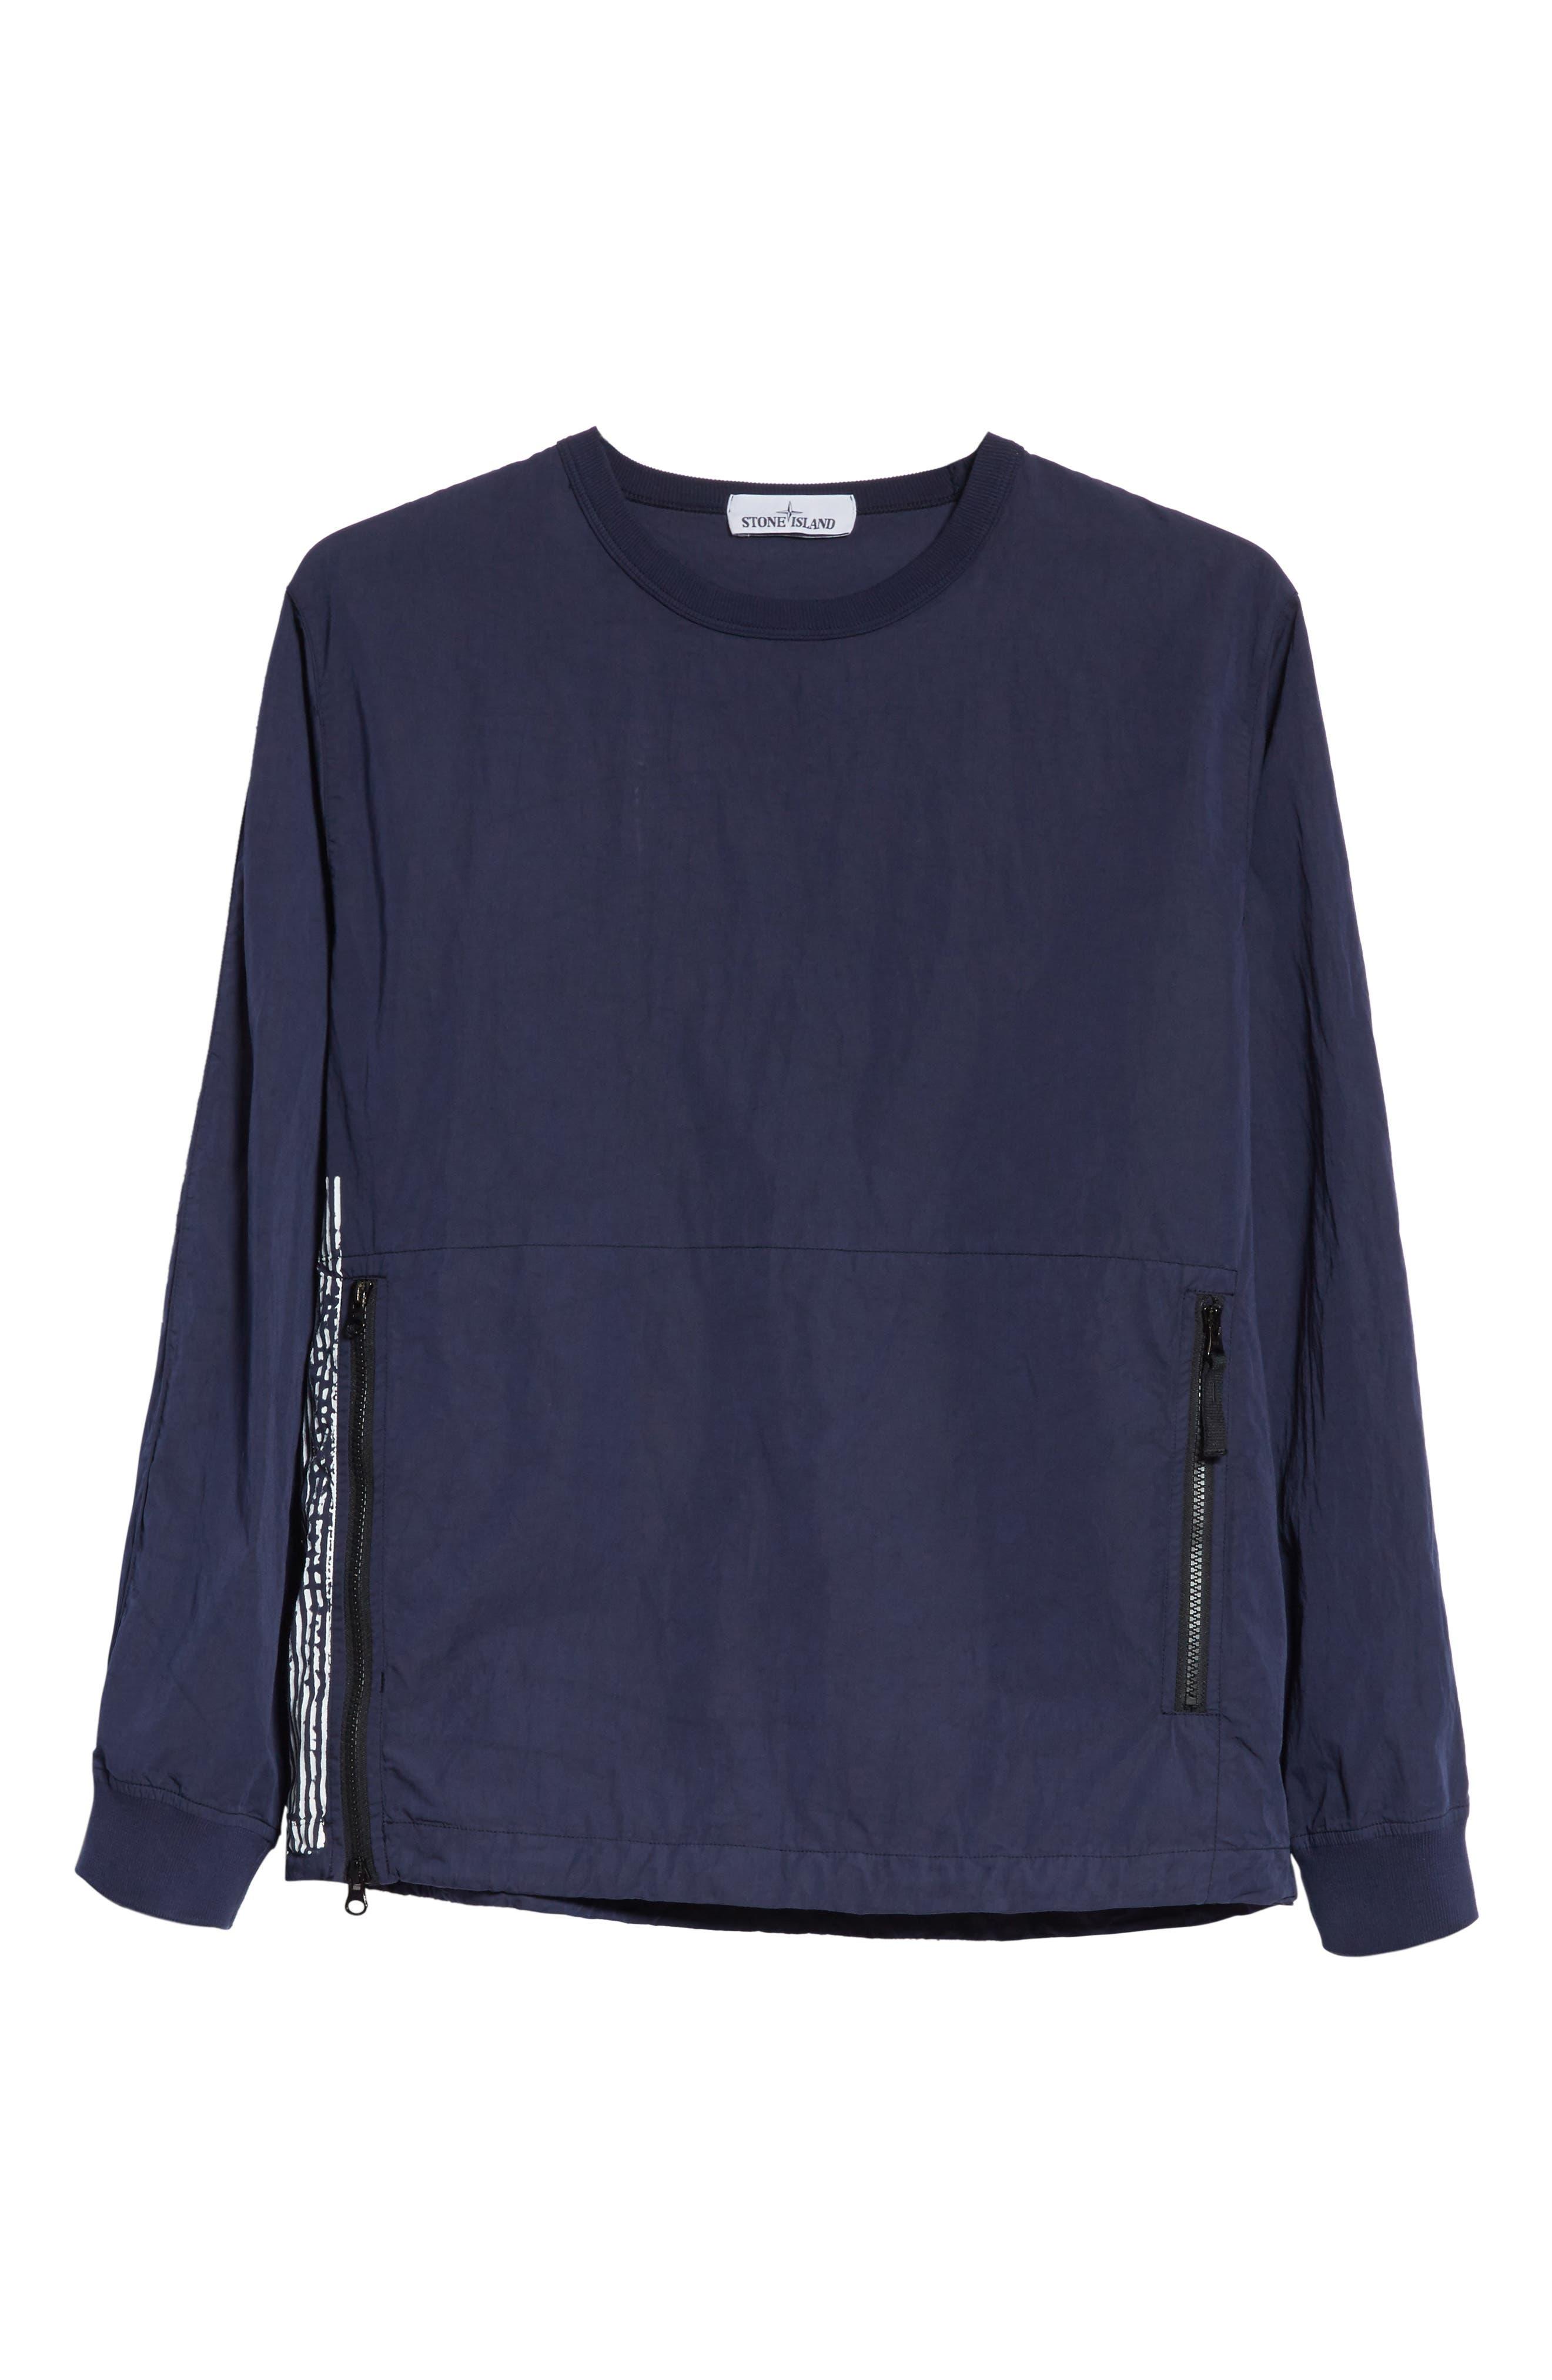 Marina Stripe Sweatshirt,                             Alternate thumbnail 6, color,                             Blue